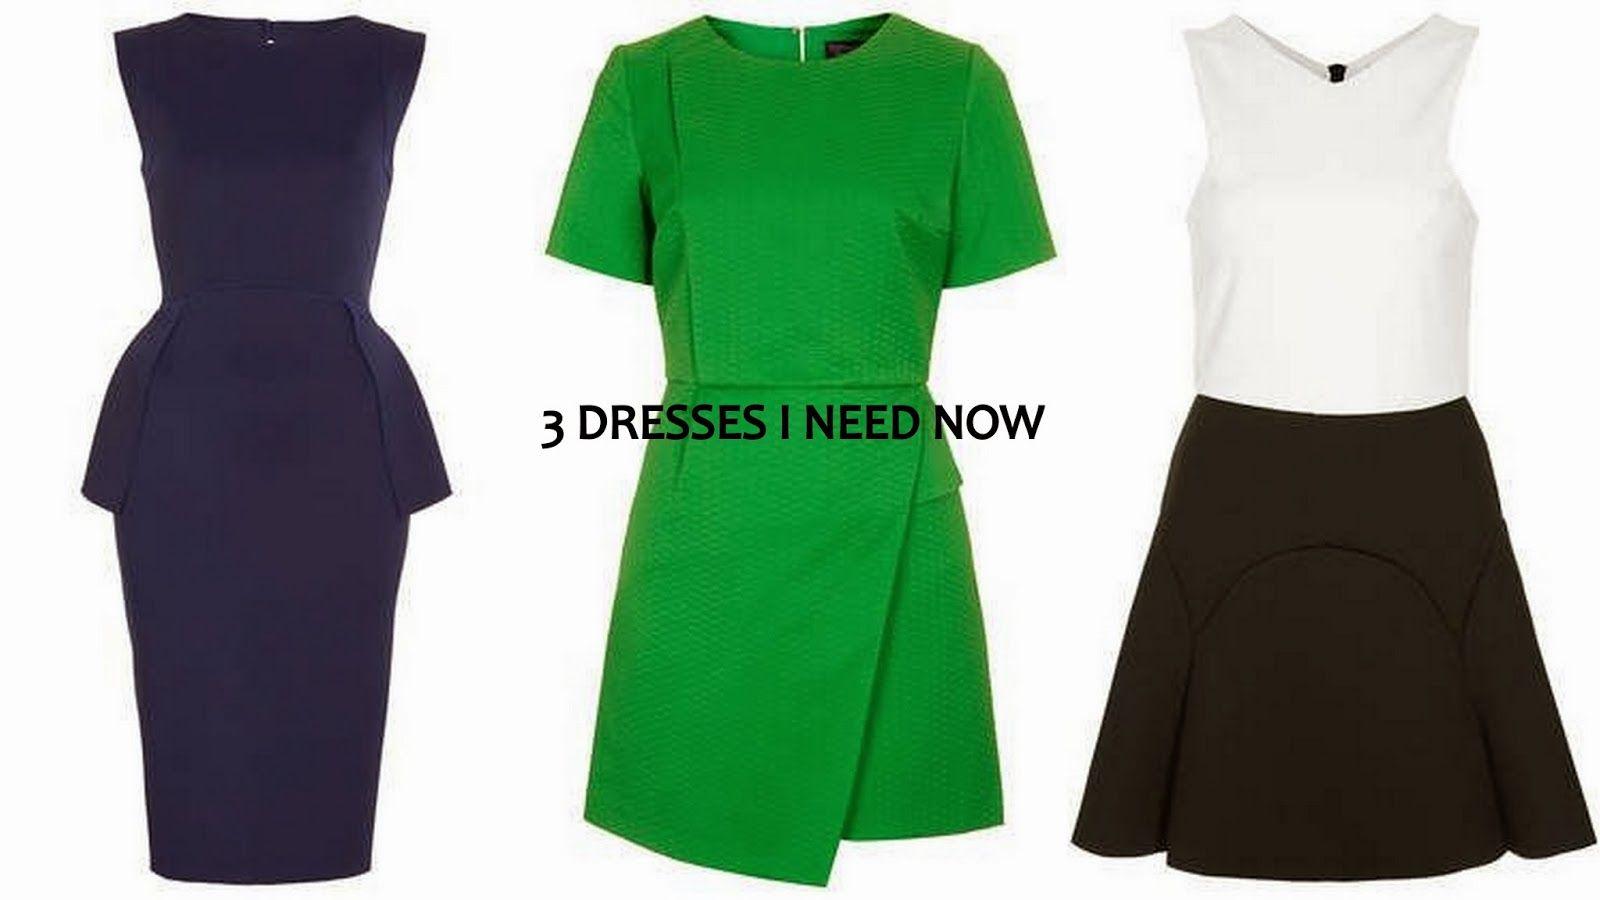 3 dresses i need now #topshop